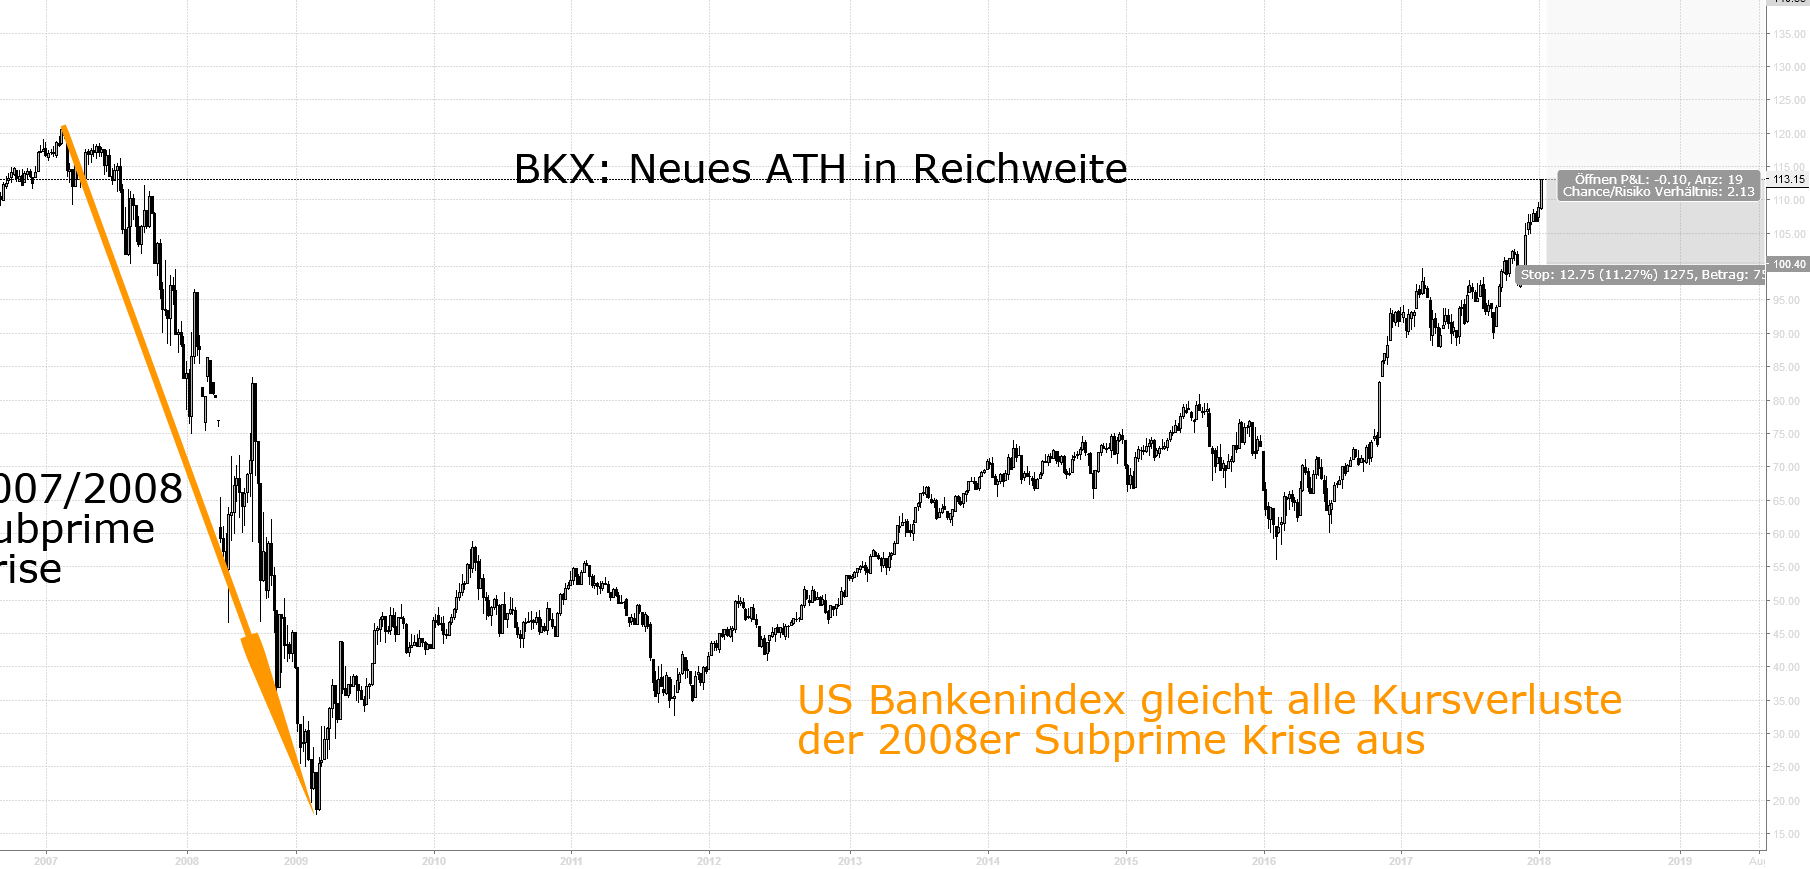 BKX: Subprime Krise überwunden